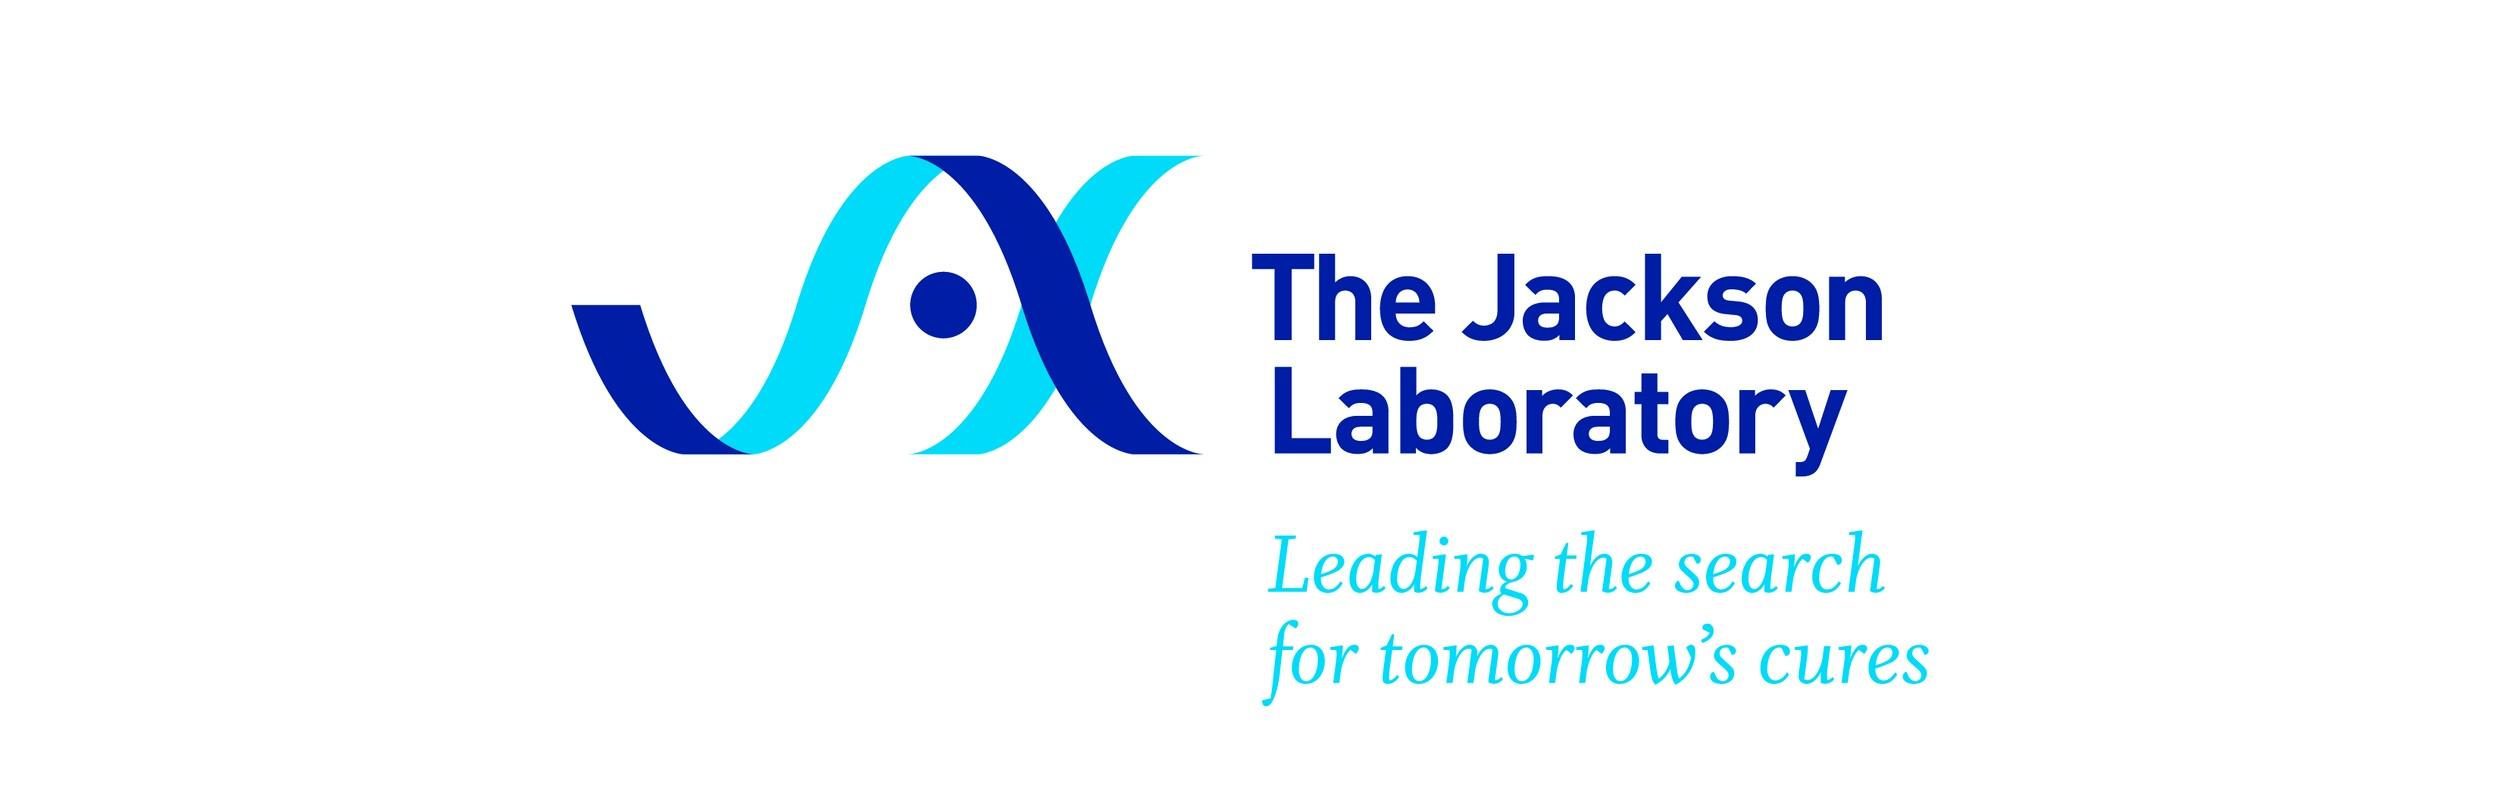 JAX_logo_CMYK_wtag.eps.jpg